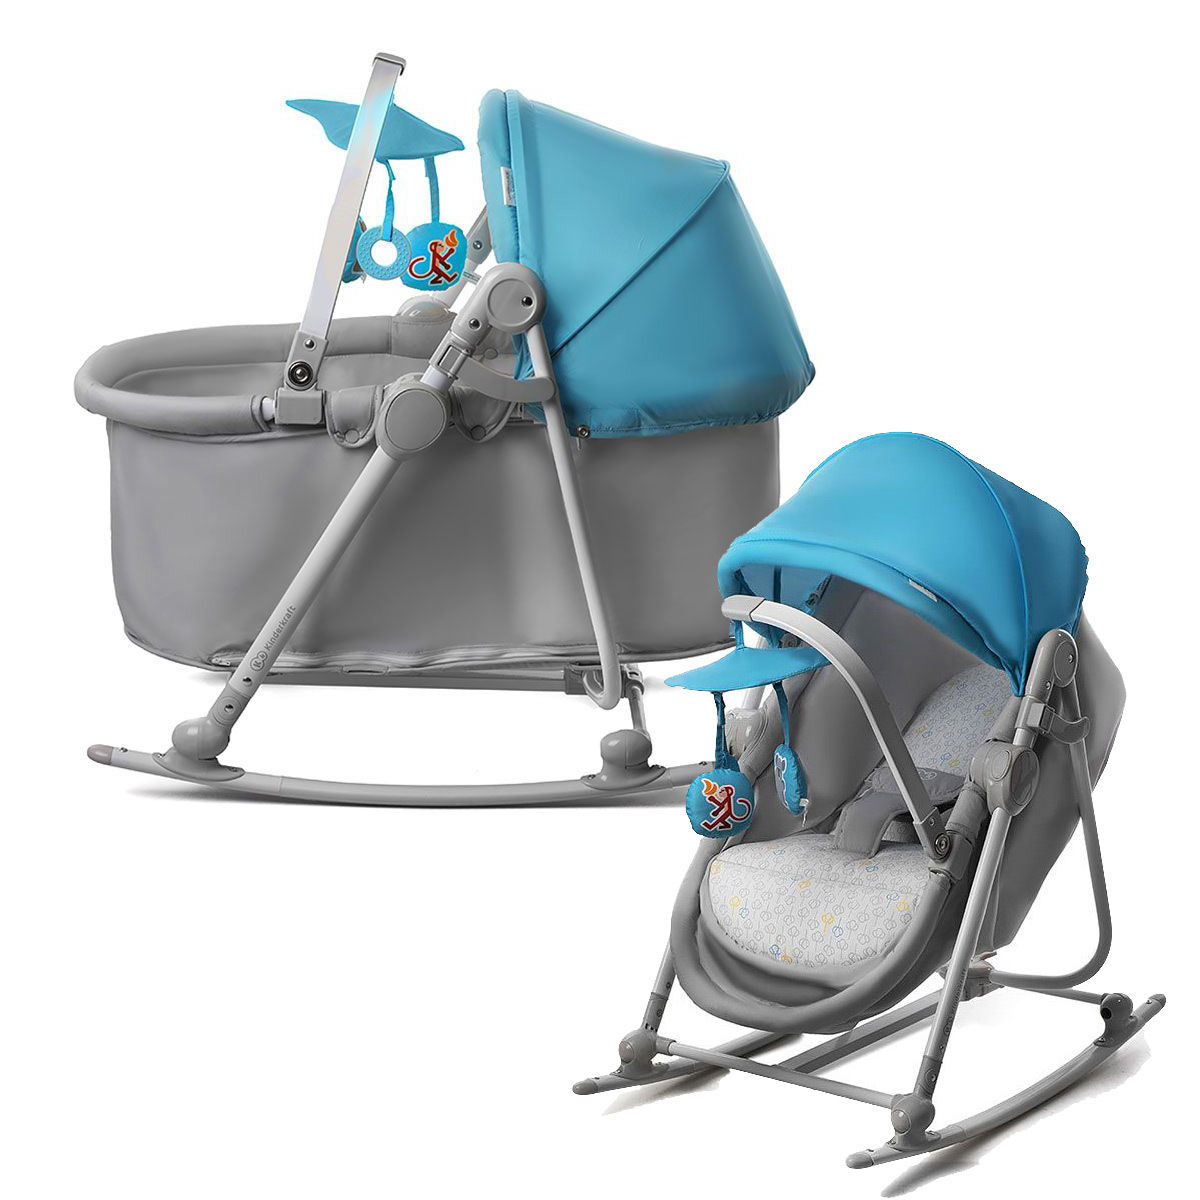 Babywippe Babyschaukel Babywiege Wippe Kinderkraft Unimo